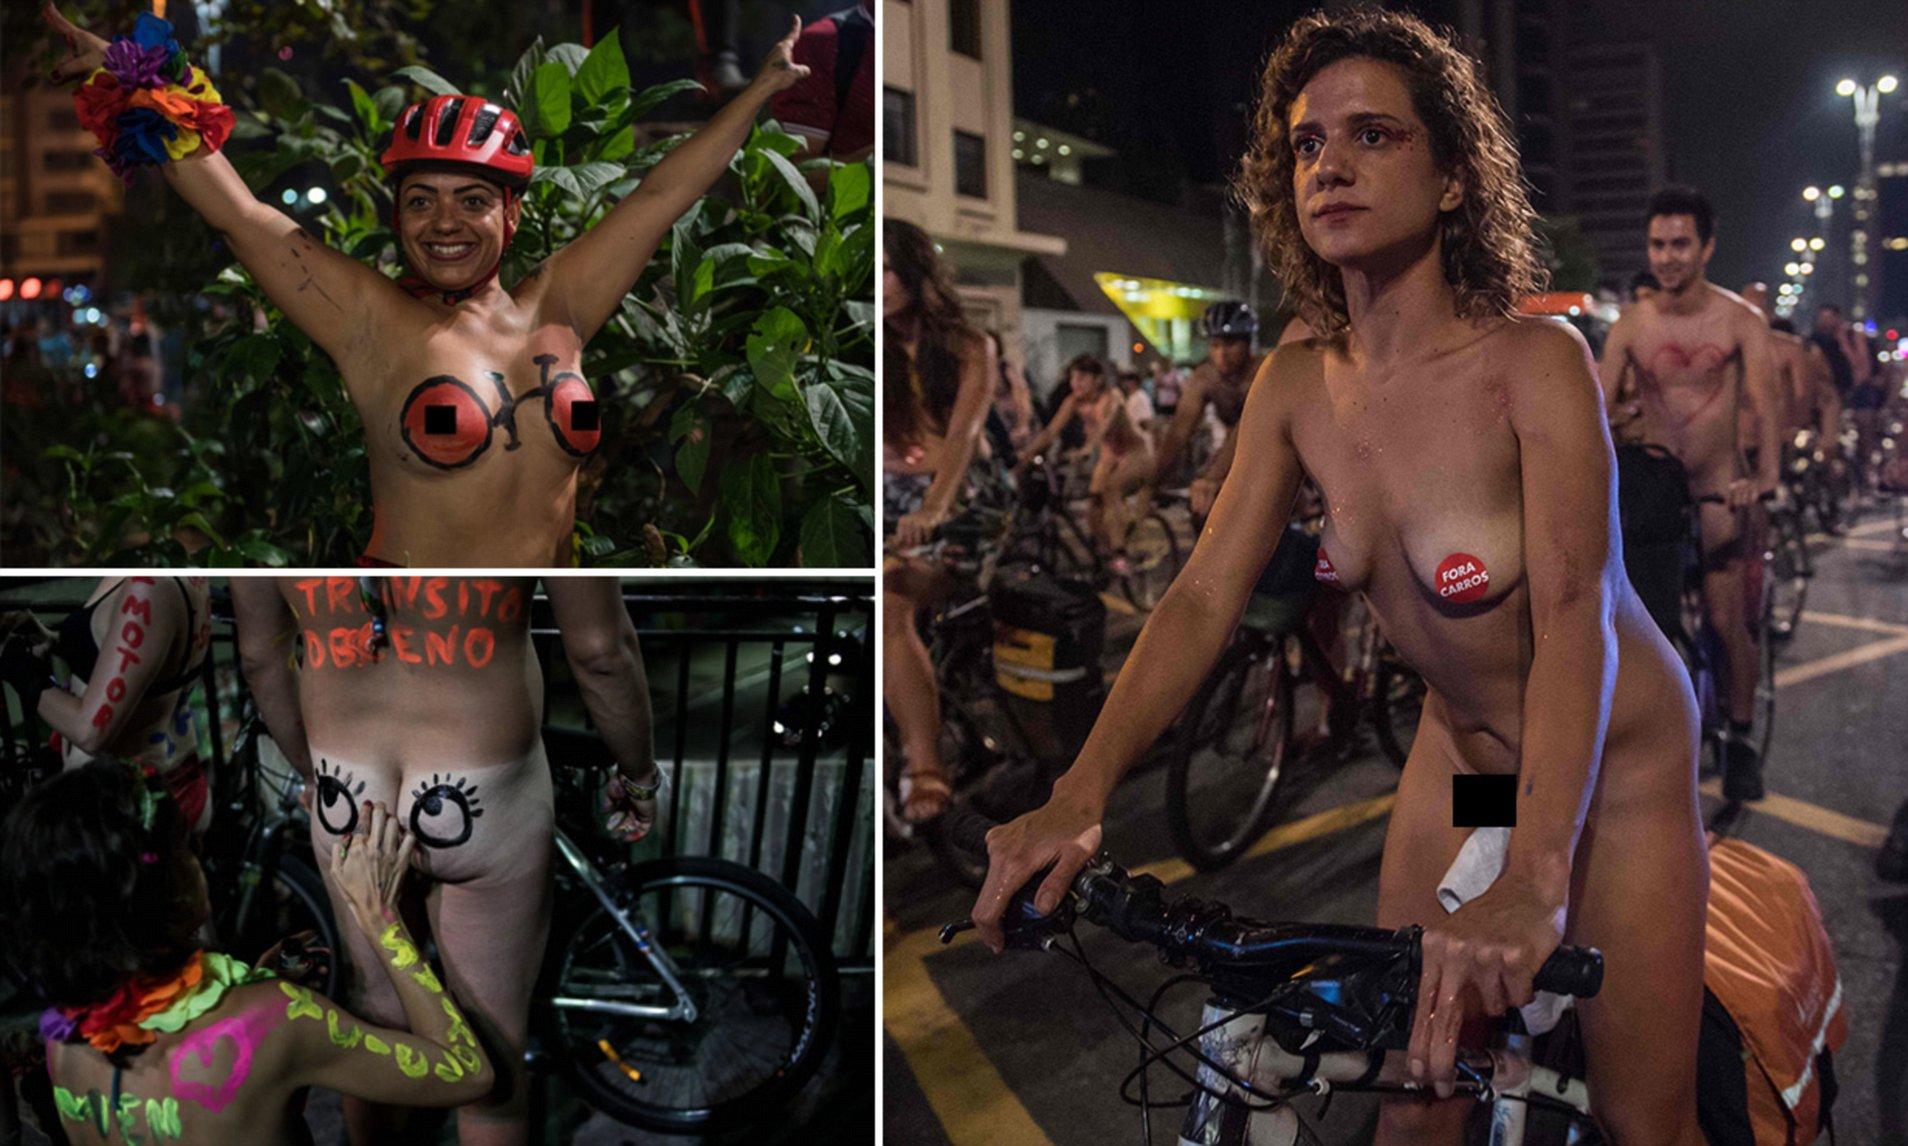 Brazilian junior boys and girls nudist